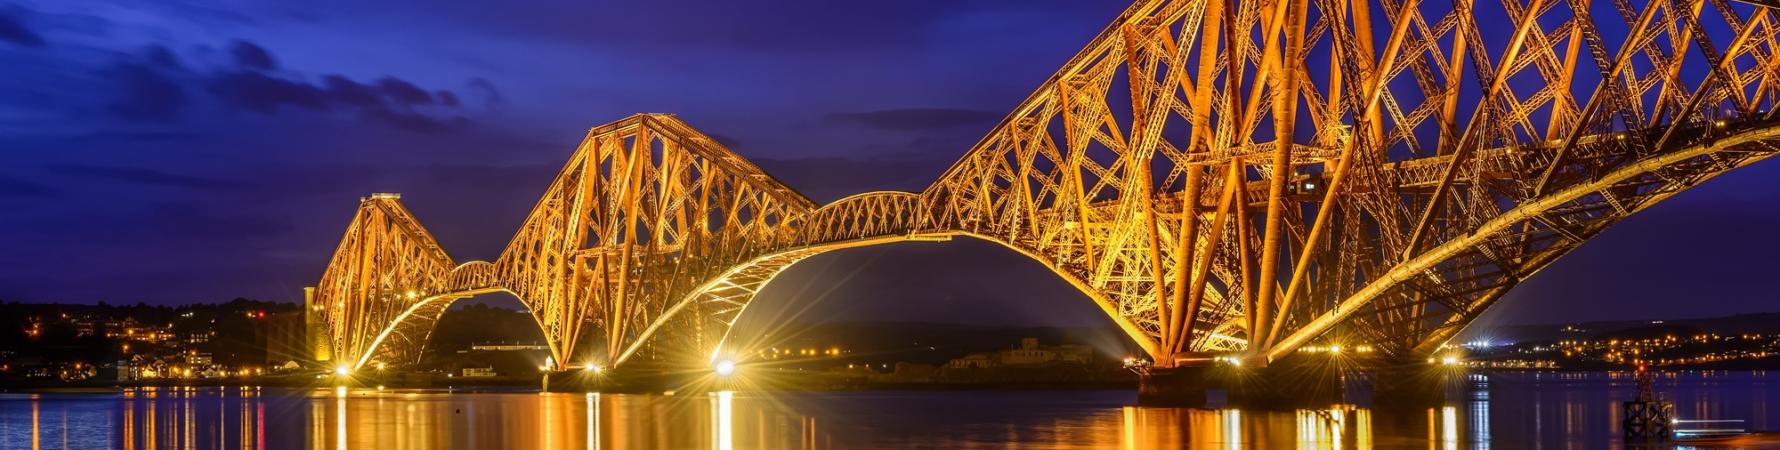 lamontdesign Design & Marketing Agency - Edinburgh, Aberdeen, Fort William, Scotland